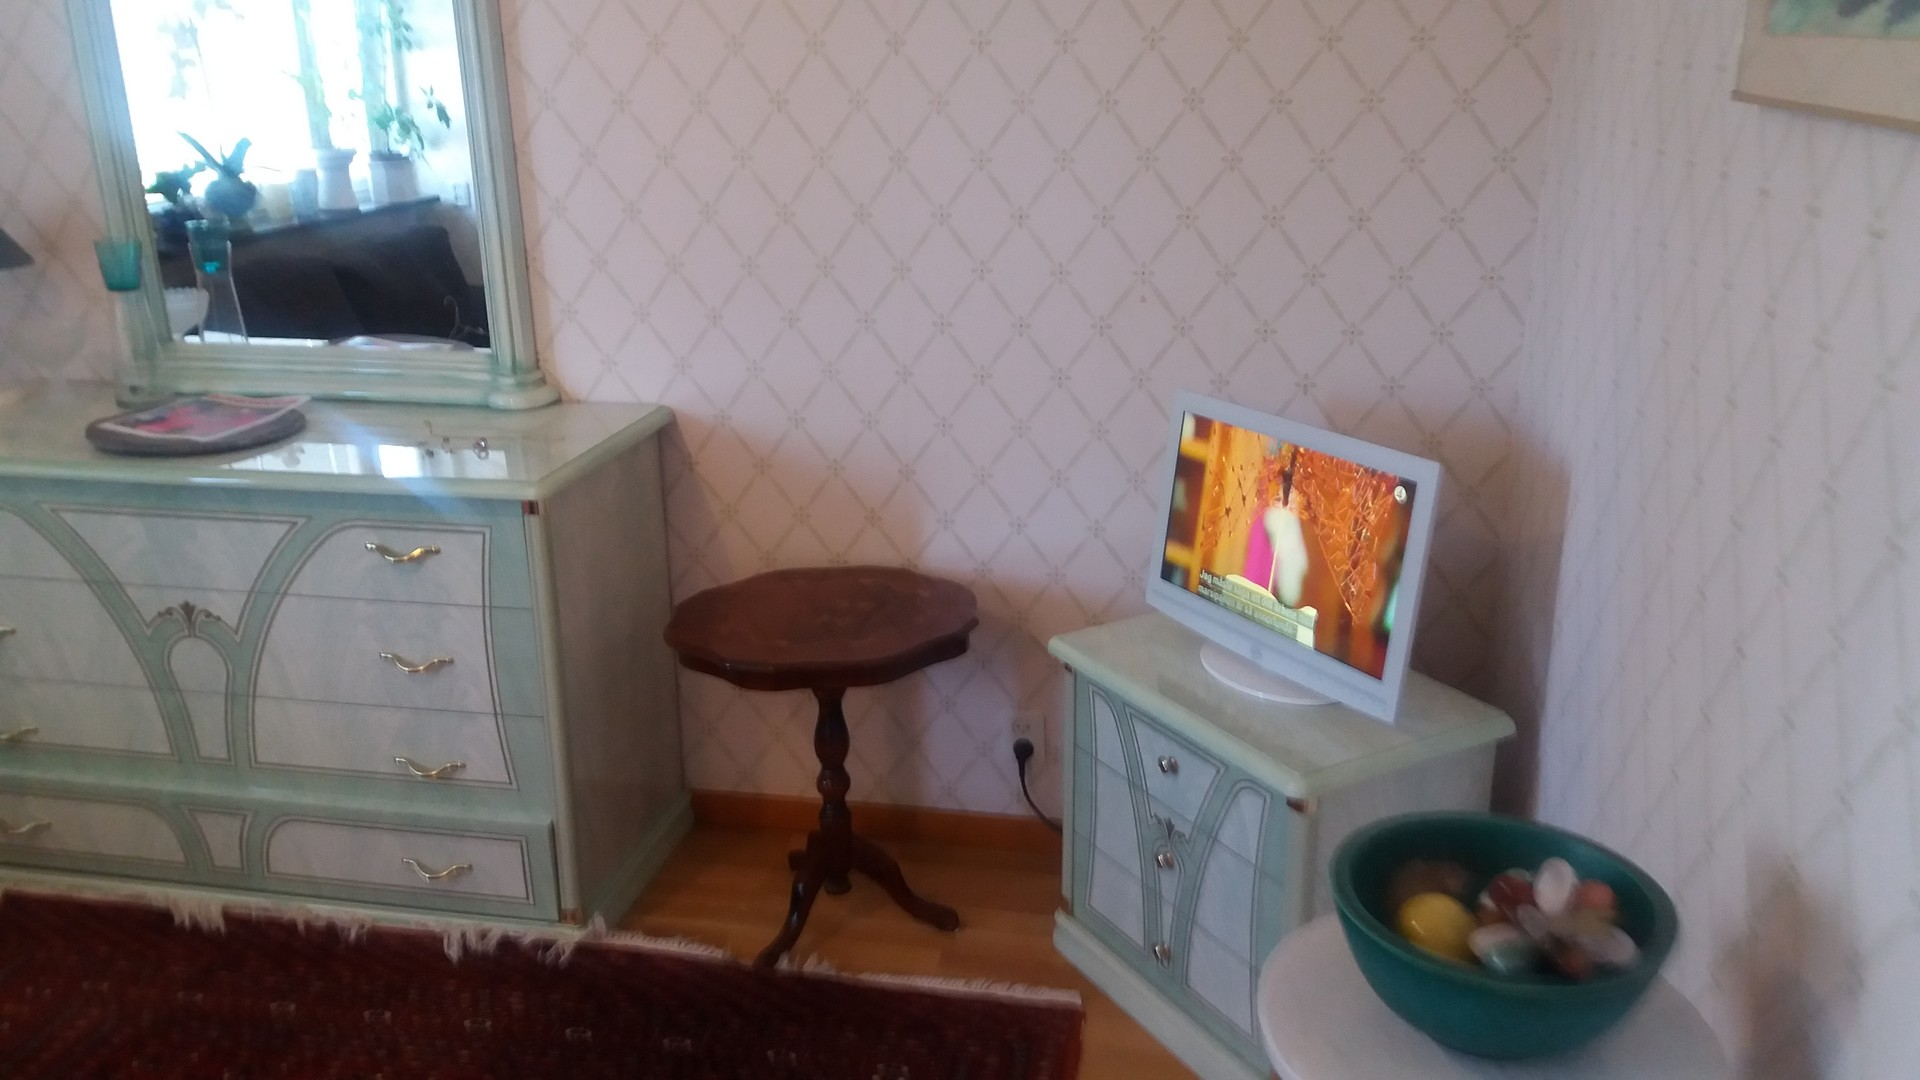 room-offer-female-student-large-room-stockholm-3cfdf129de10edee2d311a4b7a8403c6